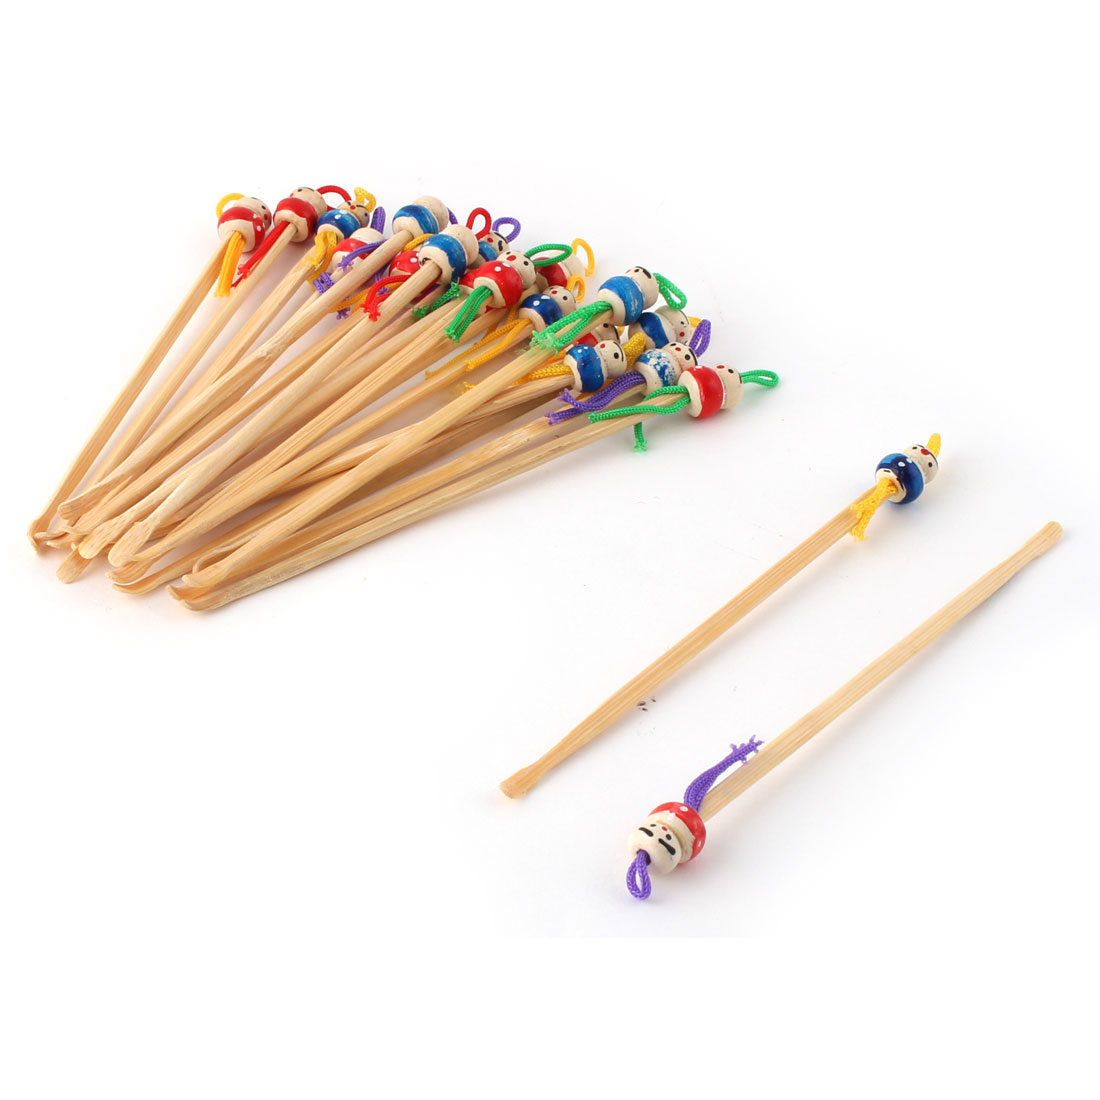 Household Bamboo Japanese Doll Decor Ear Pick Earwax Remove Beige 20 Pcs